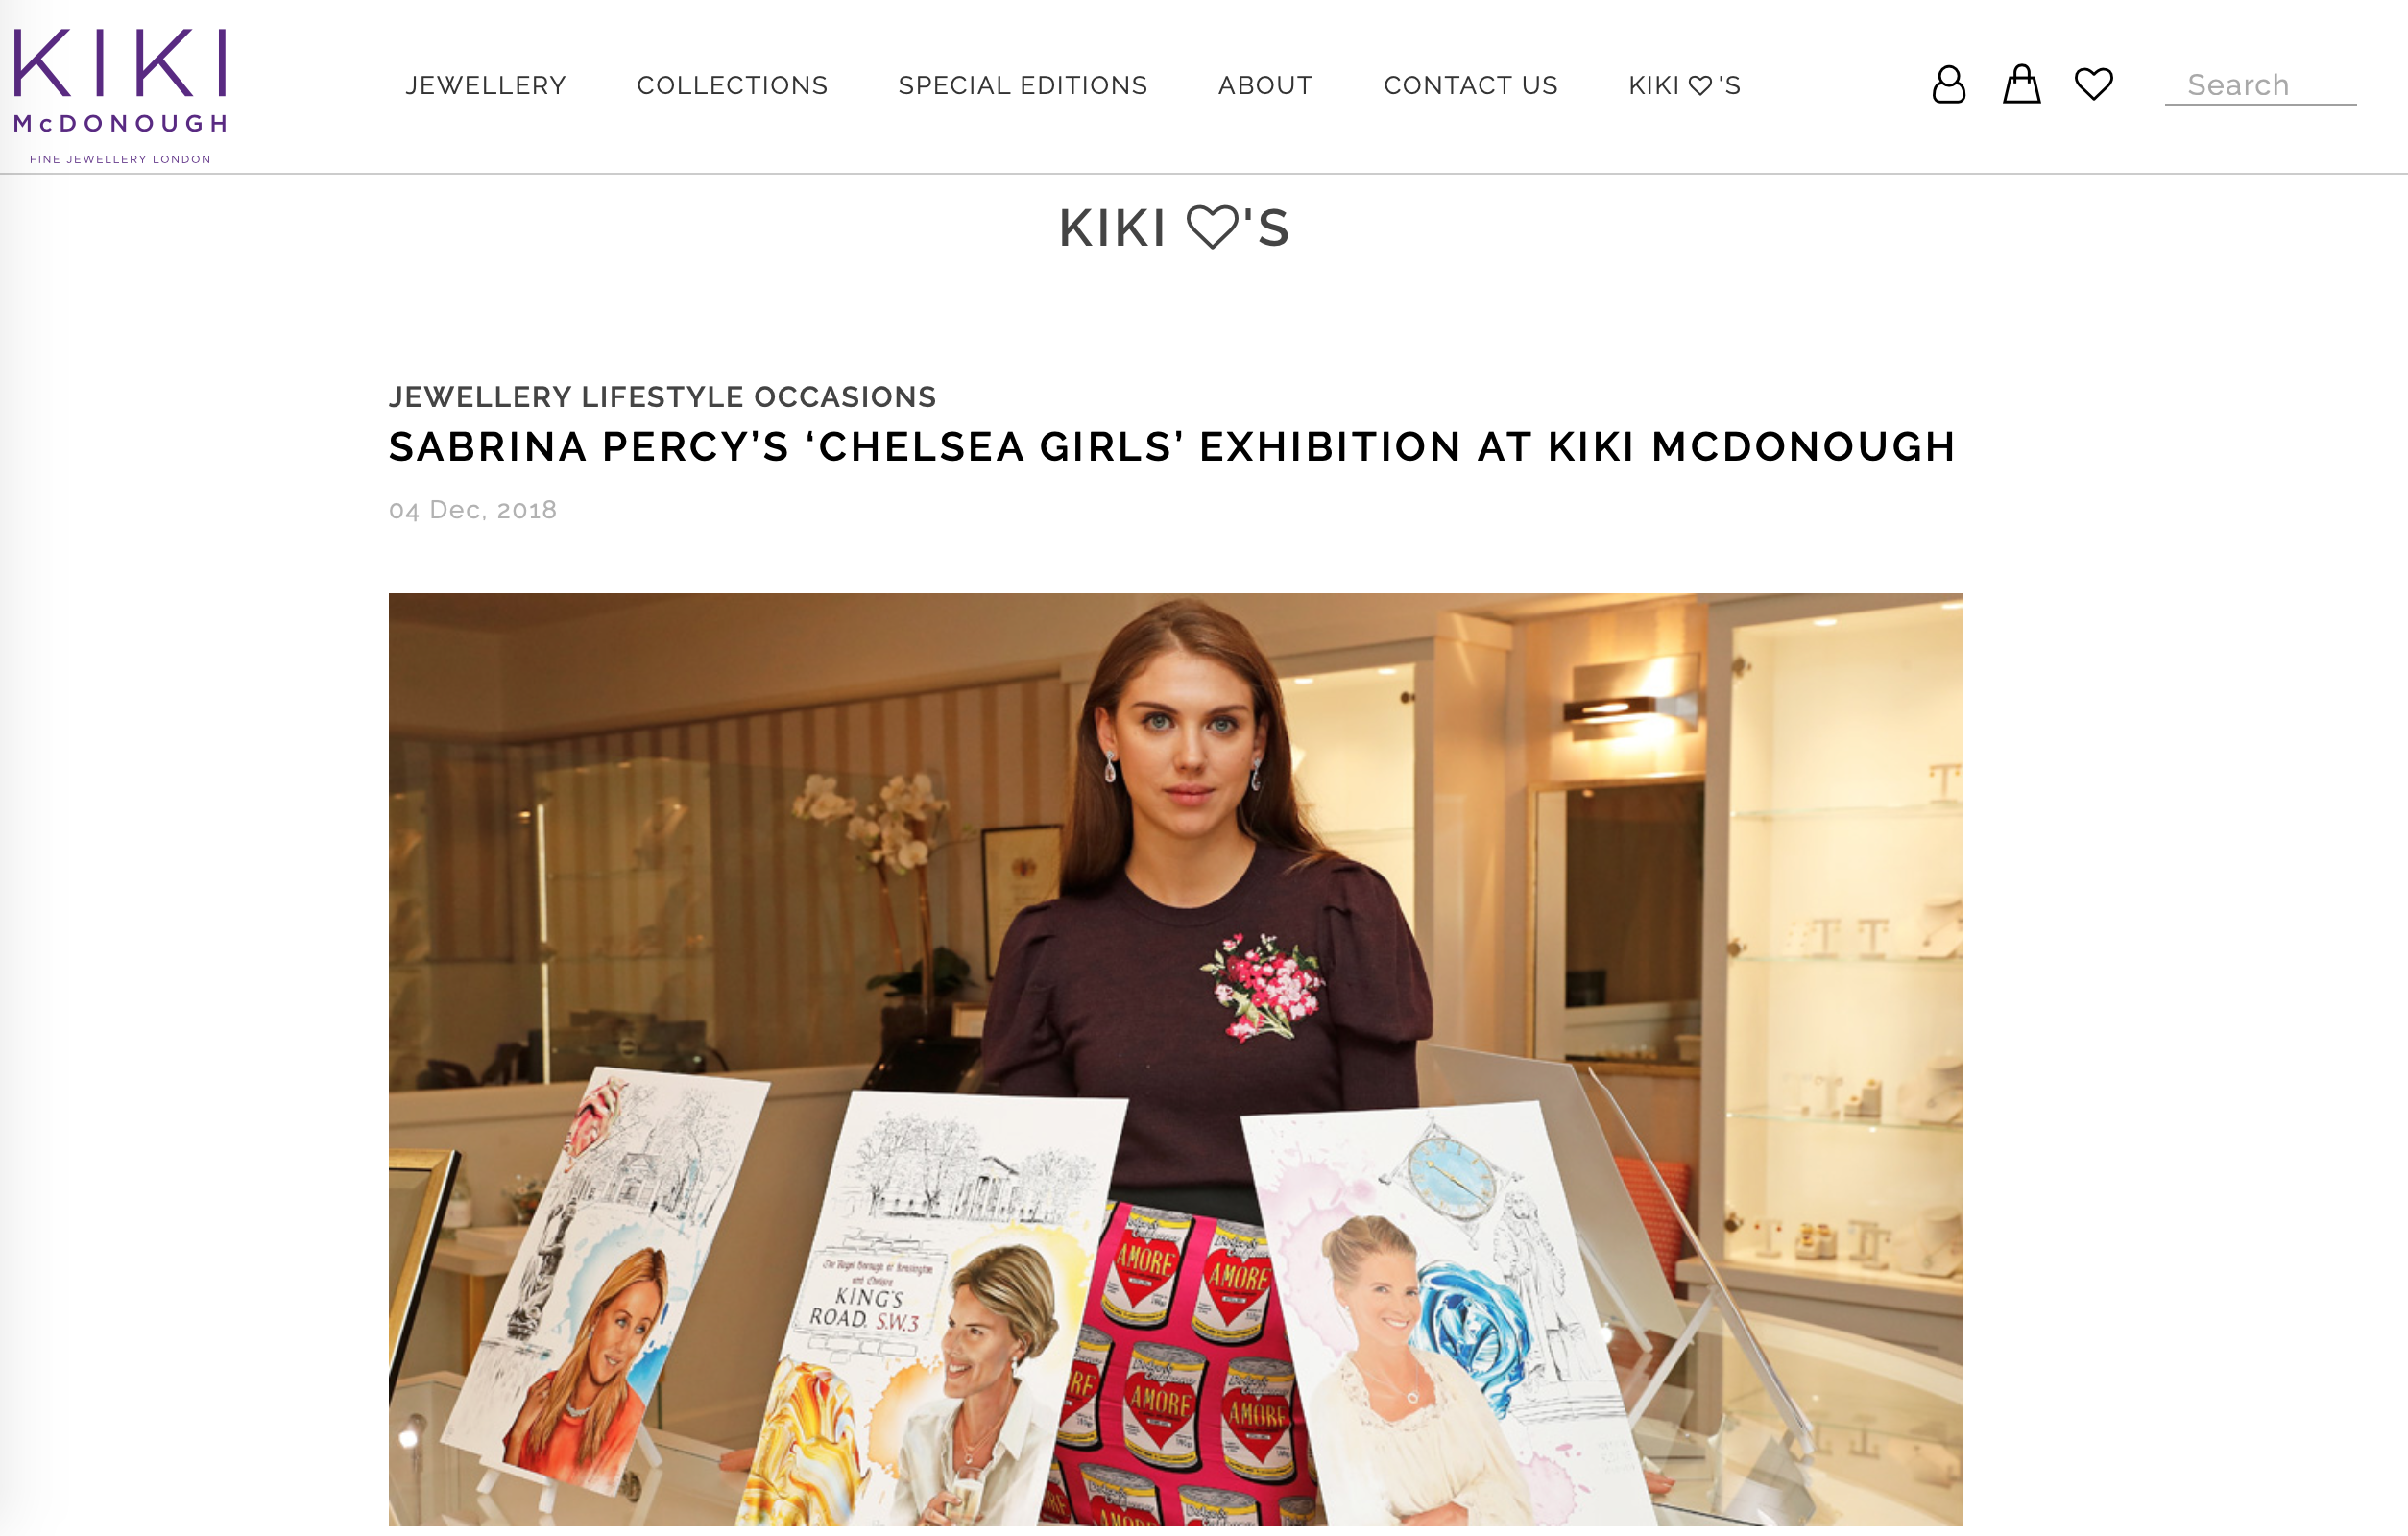 Collaboration with Kiki McDonough